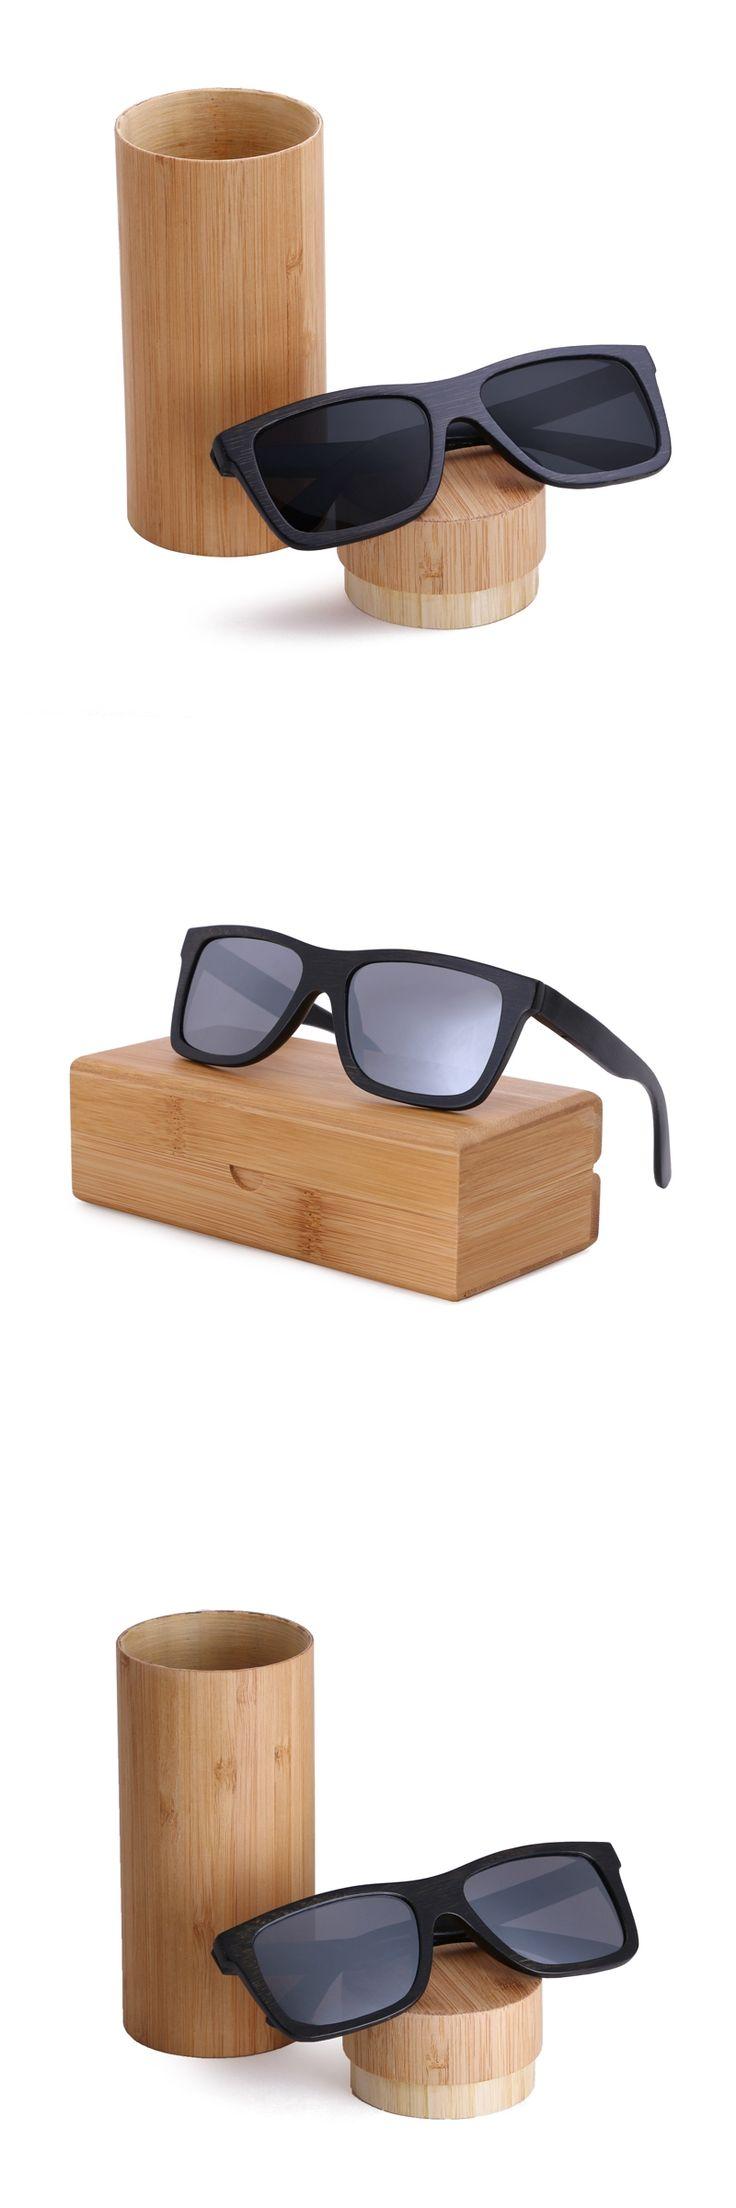 2016 new black  frame bamboo sunglasses polarized lens wooden sunglasses